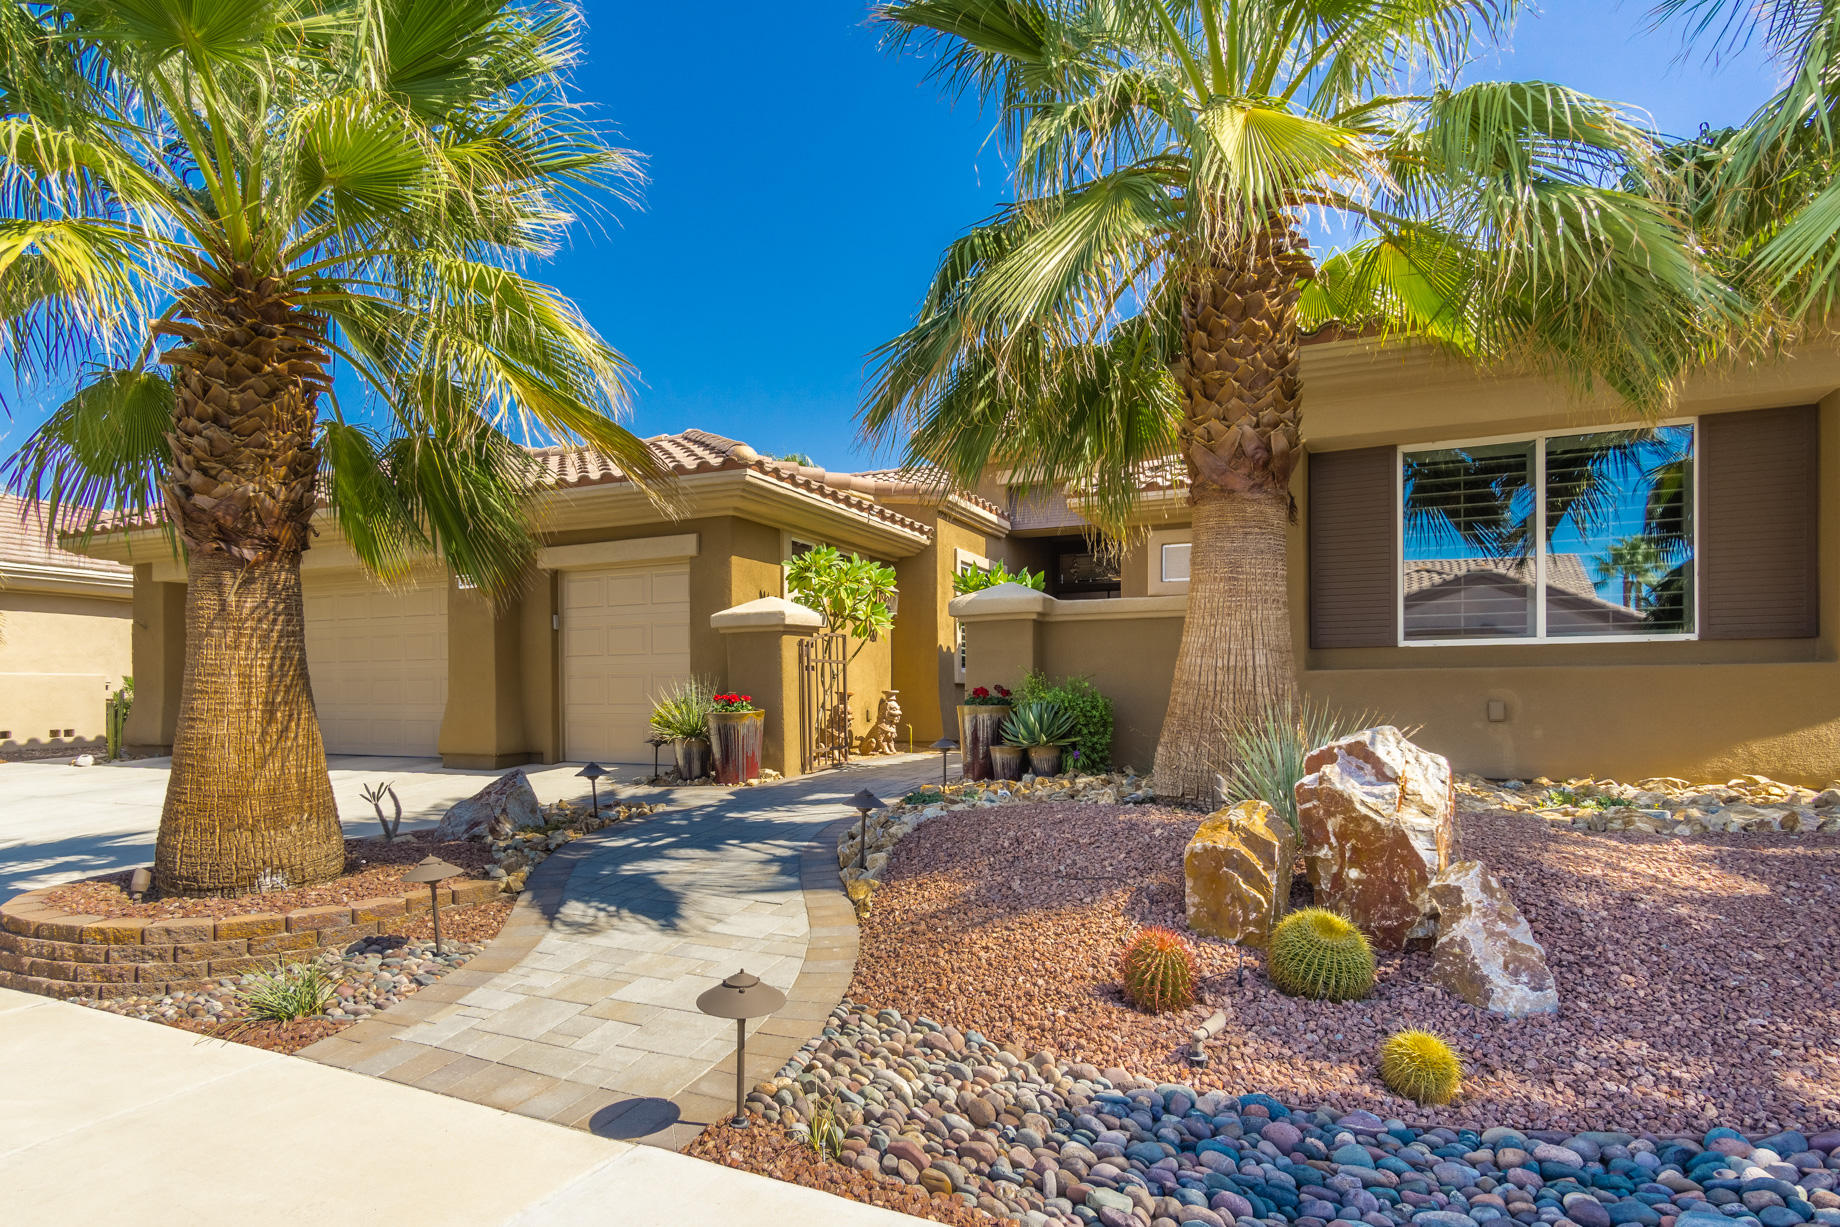 Photo of 35884 Crescent Street, Palm Desert, CA 92211